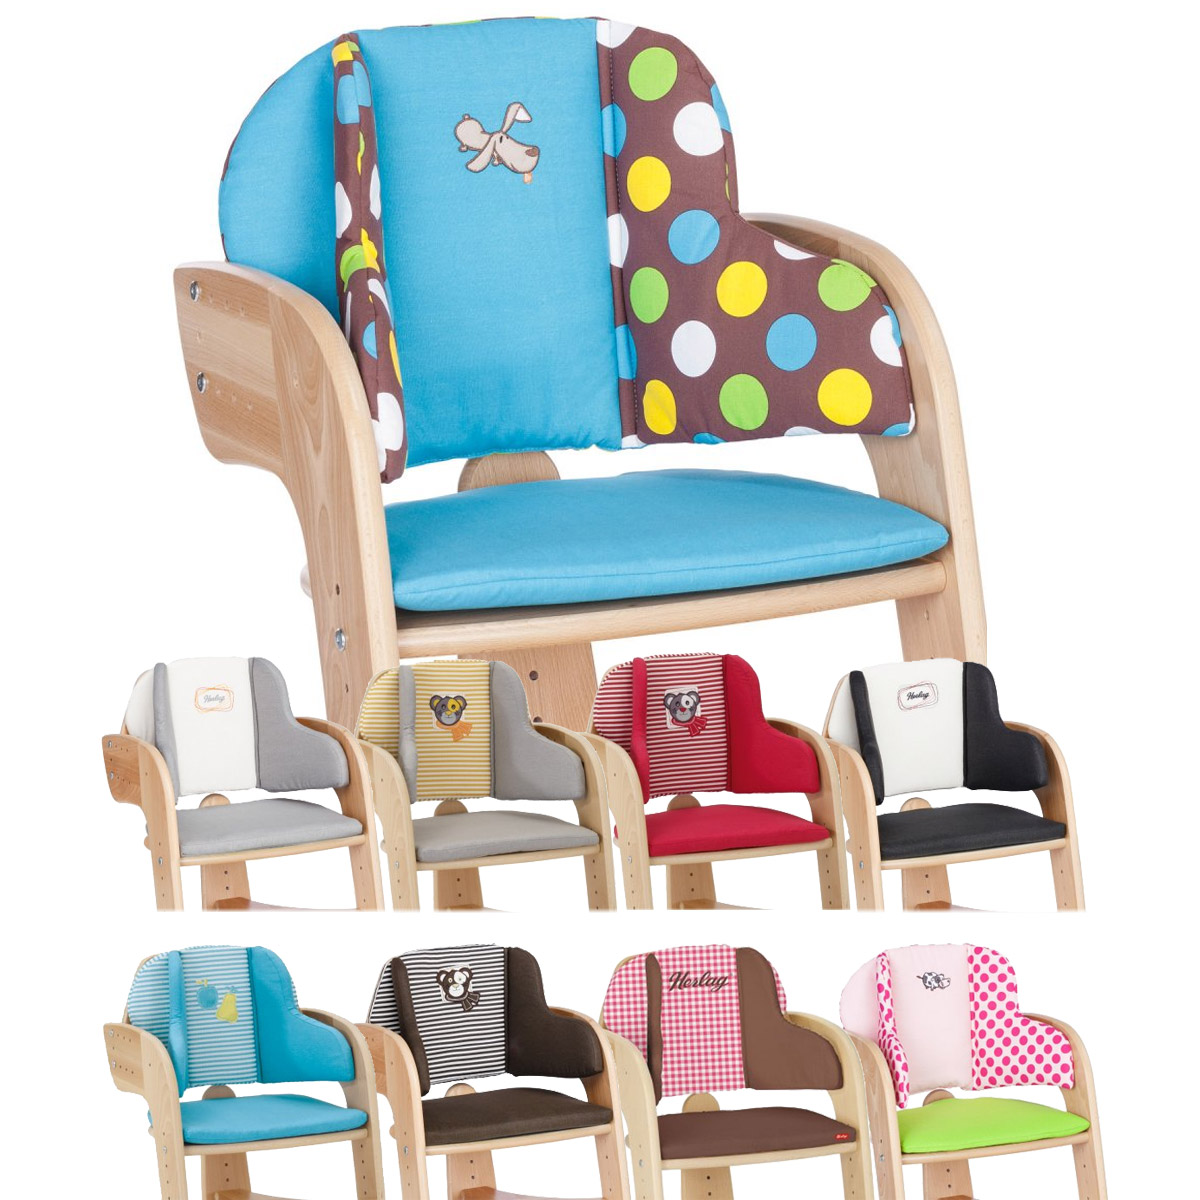 herlag sitzpolster f r hochstuhl tipp topp comfort iv ebay. Black Bedroom Furniture Sets. Home Design Ideas